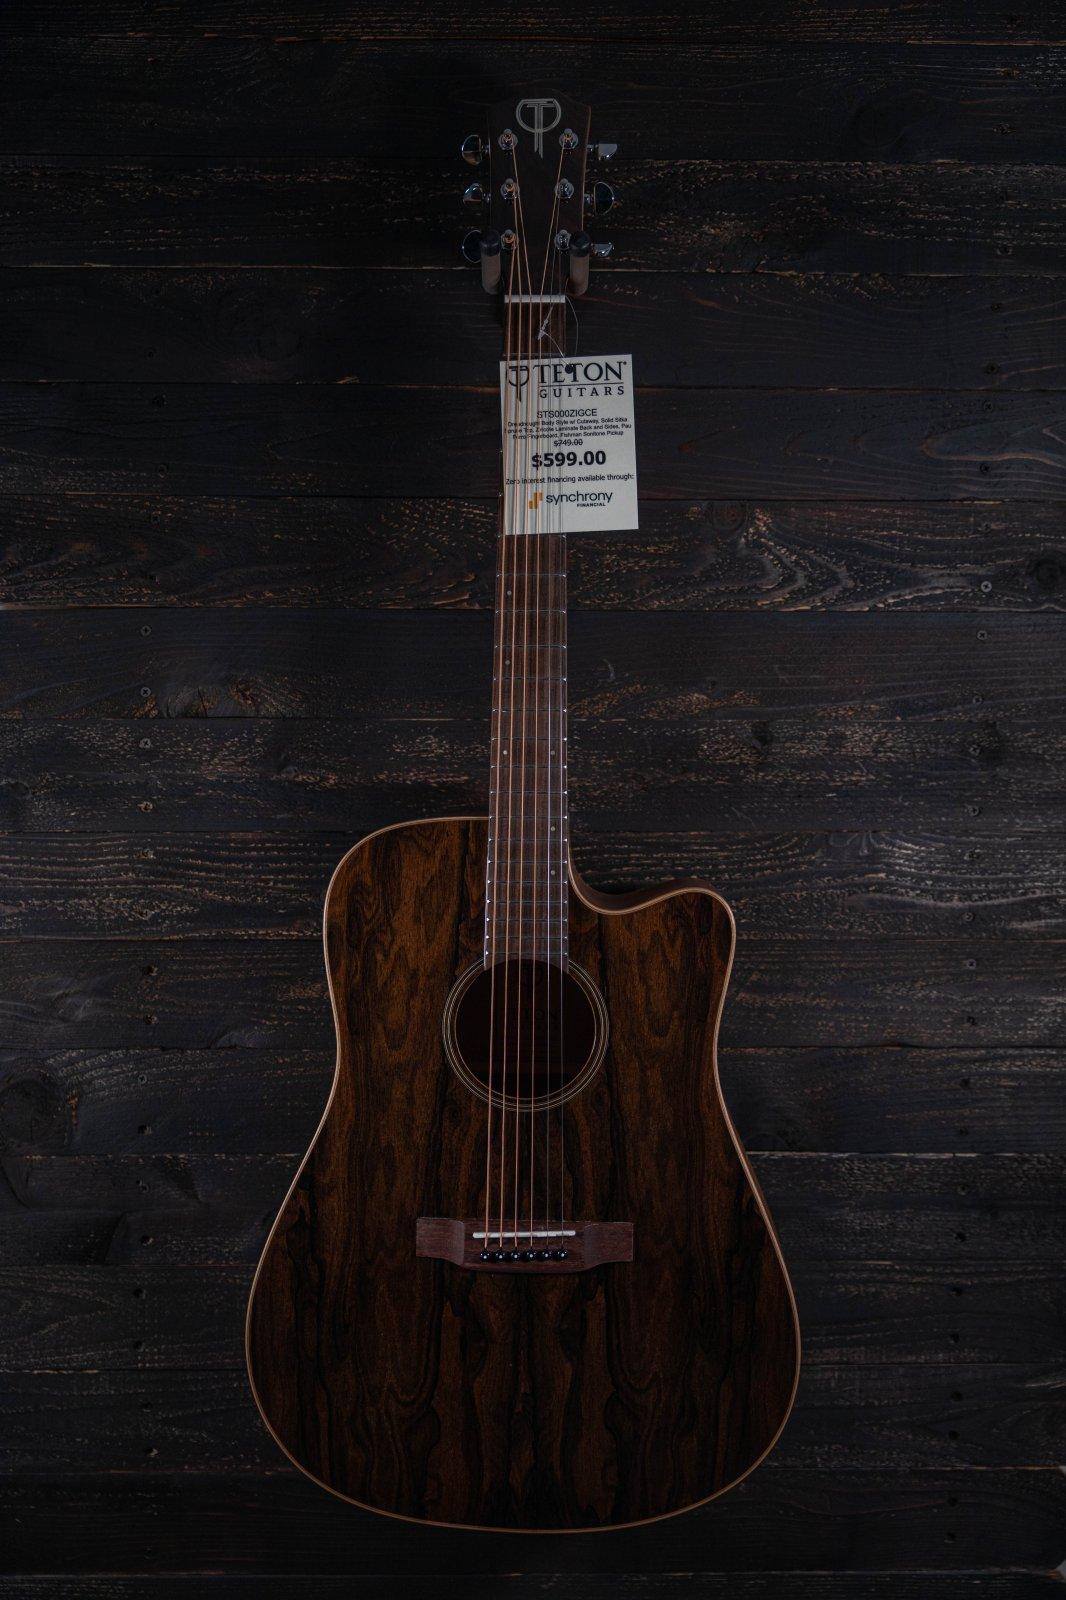 Teton STS000ZIGCE Dreadnought A/E Guitar